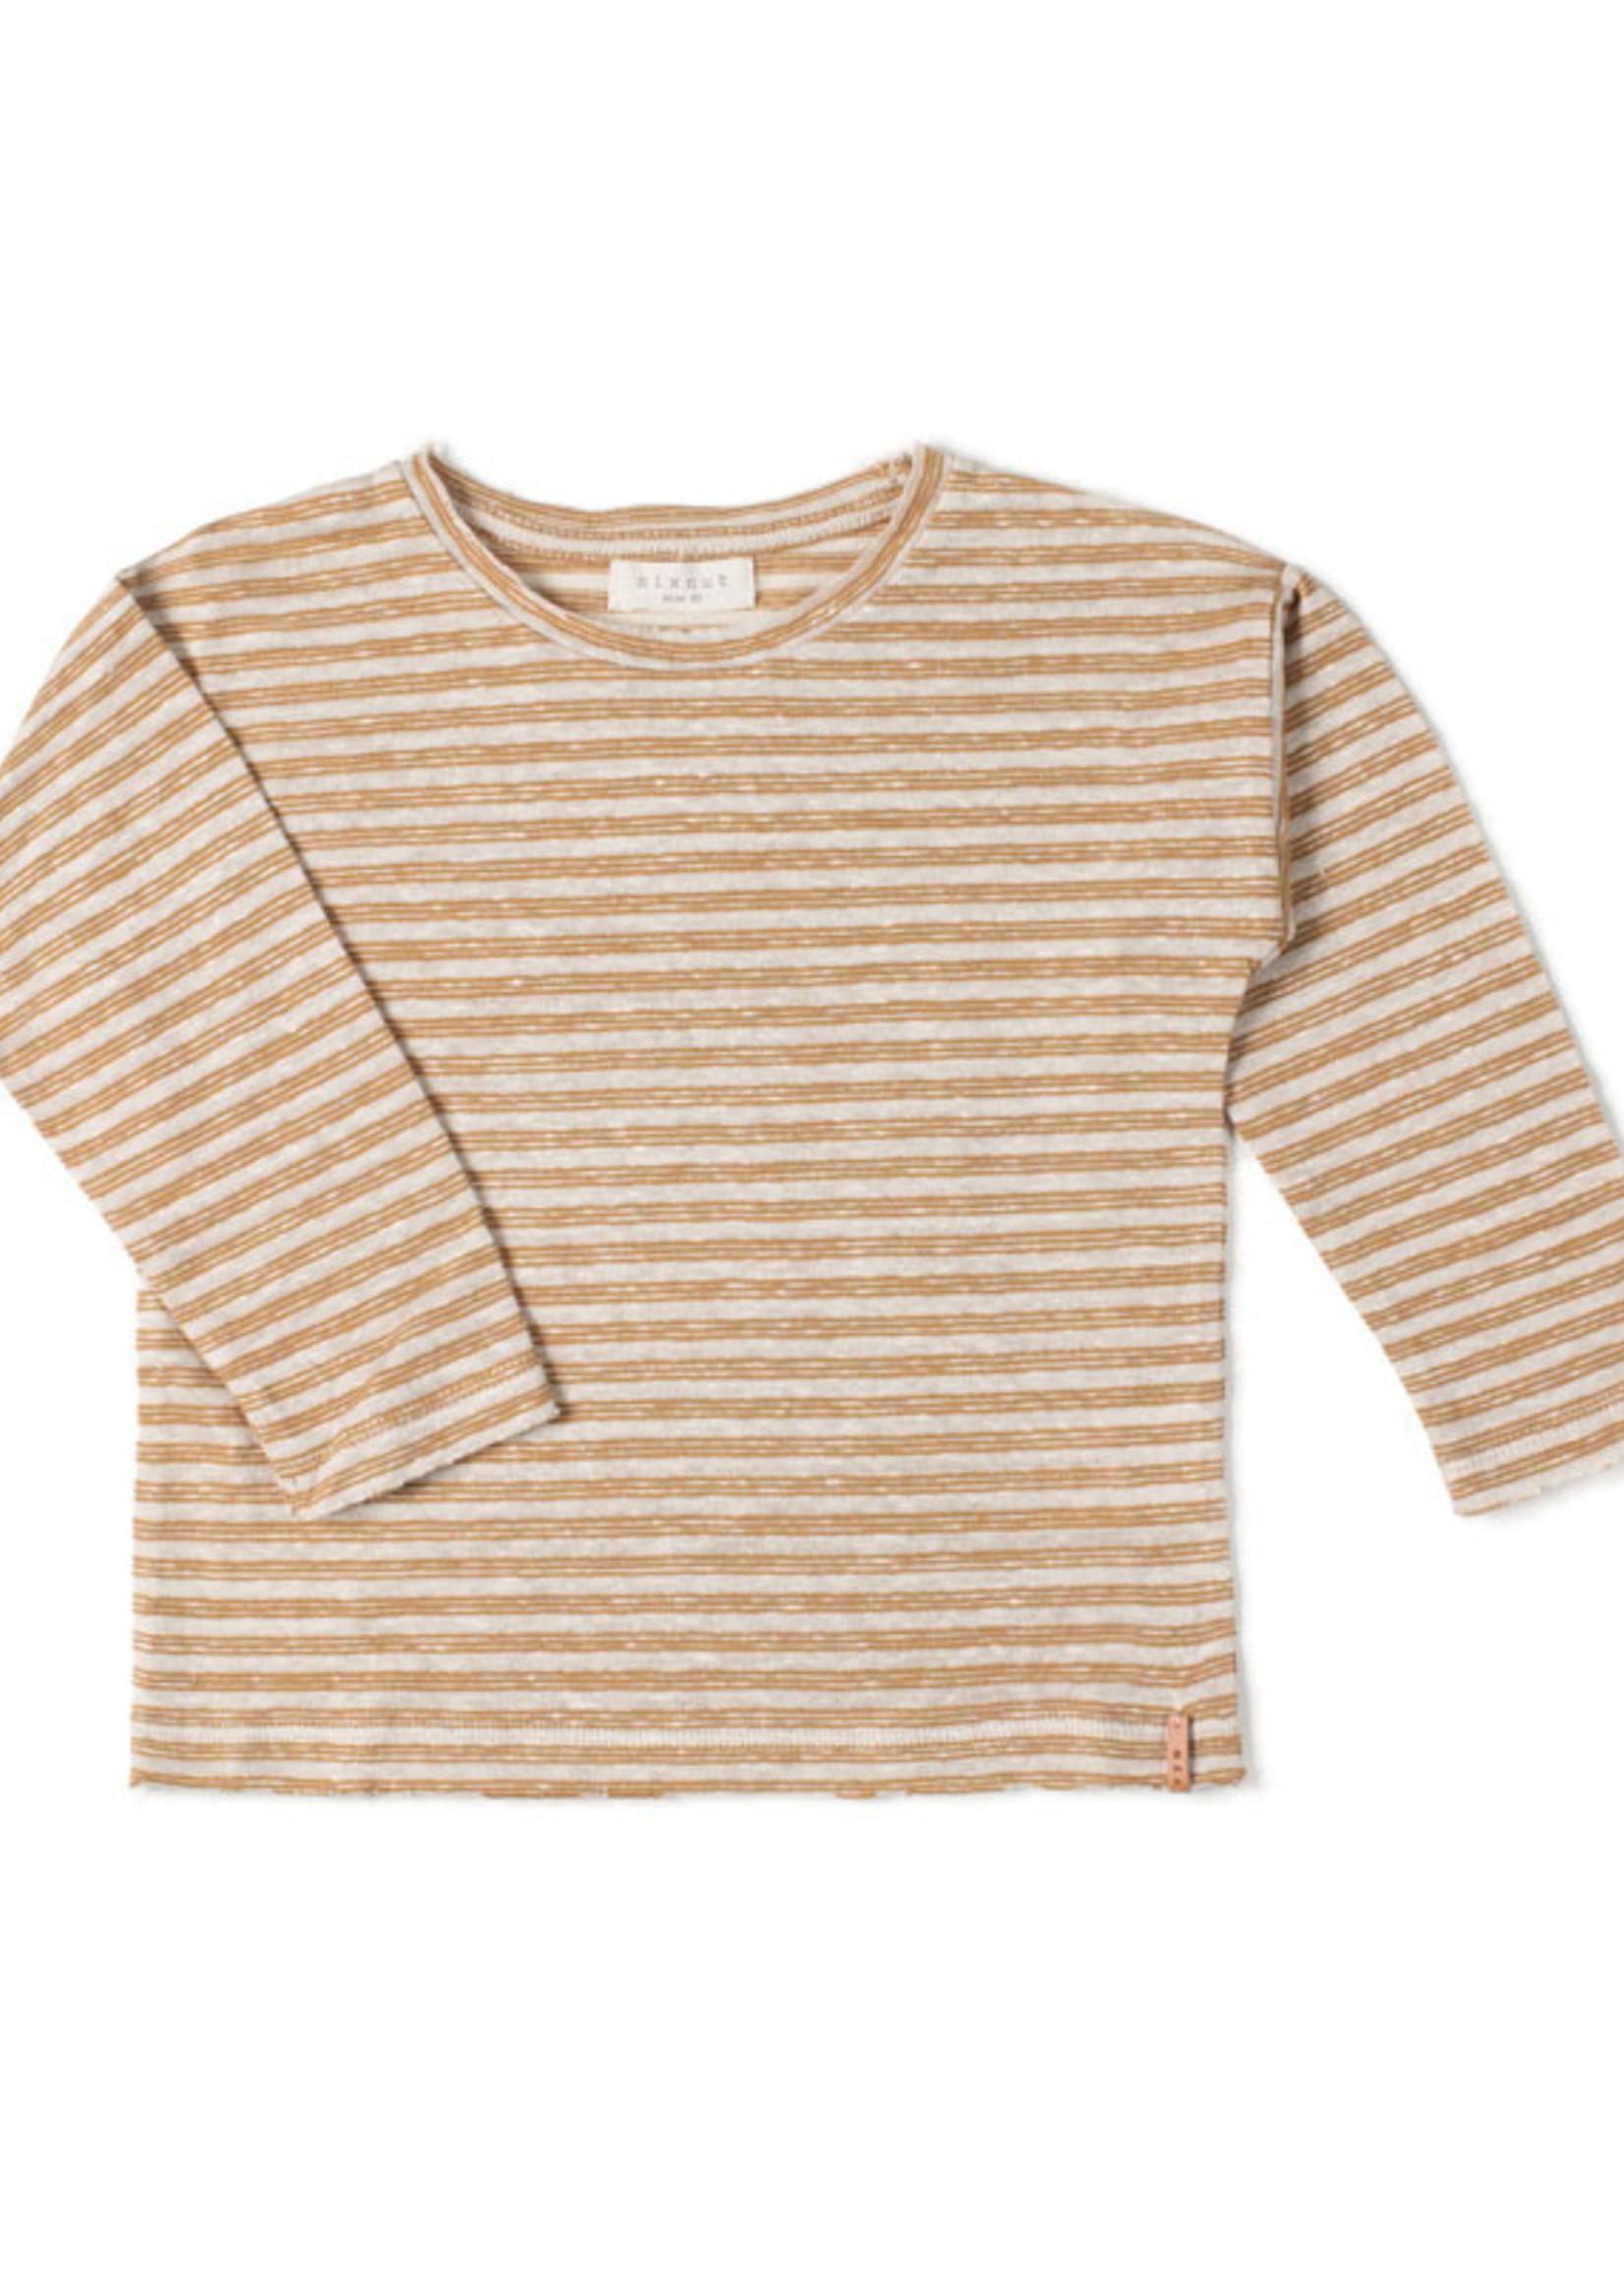 Nixnut Longsleeve Stripe - Caramel